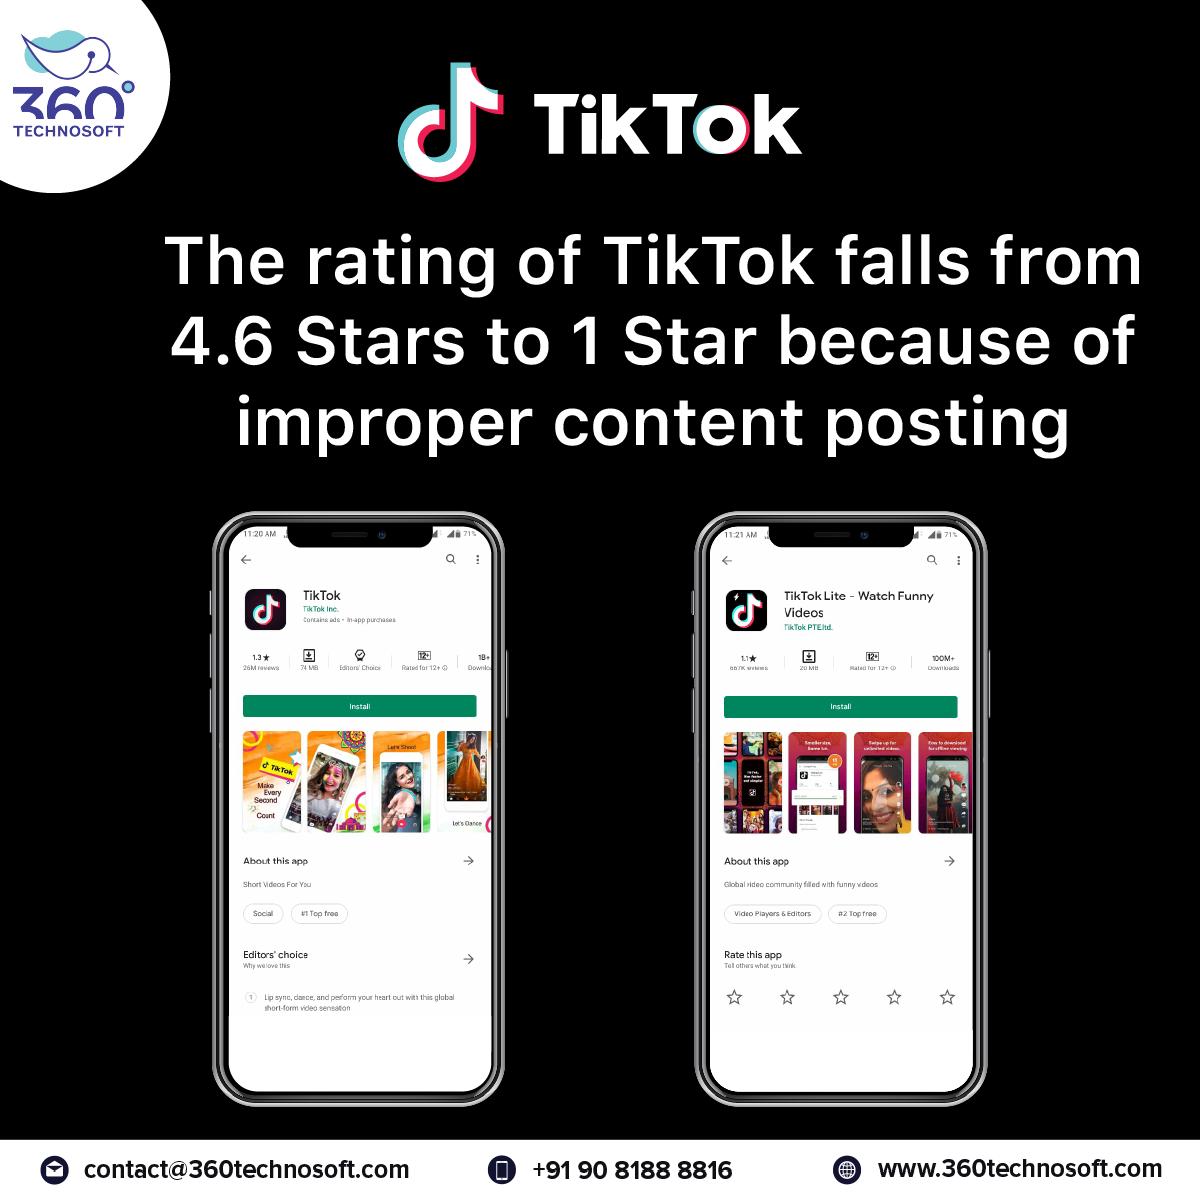 Tiktok In Trouble Mobile App Development Mobile App Development Companies App Development